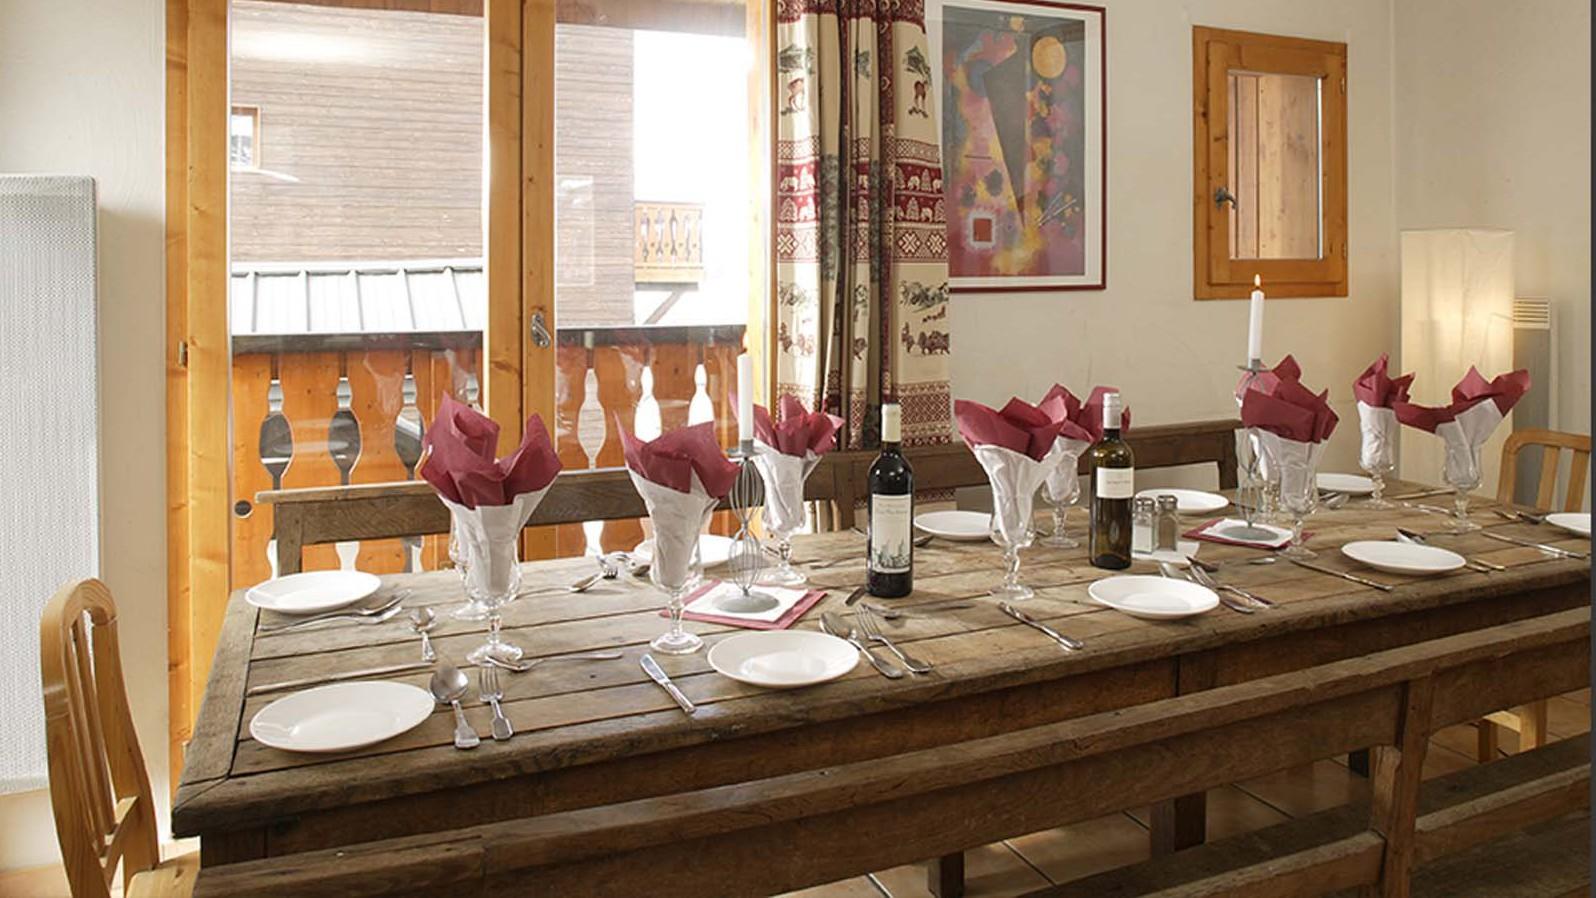 Dining Area, Chalet Joly, La Plagne, France